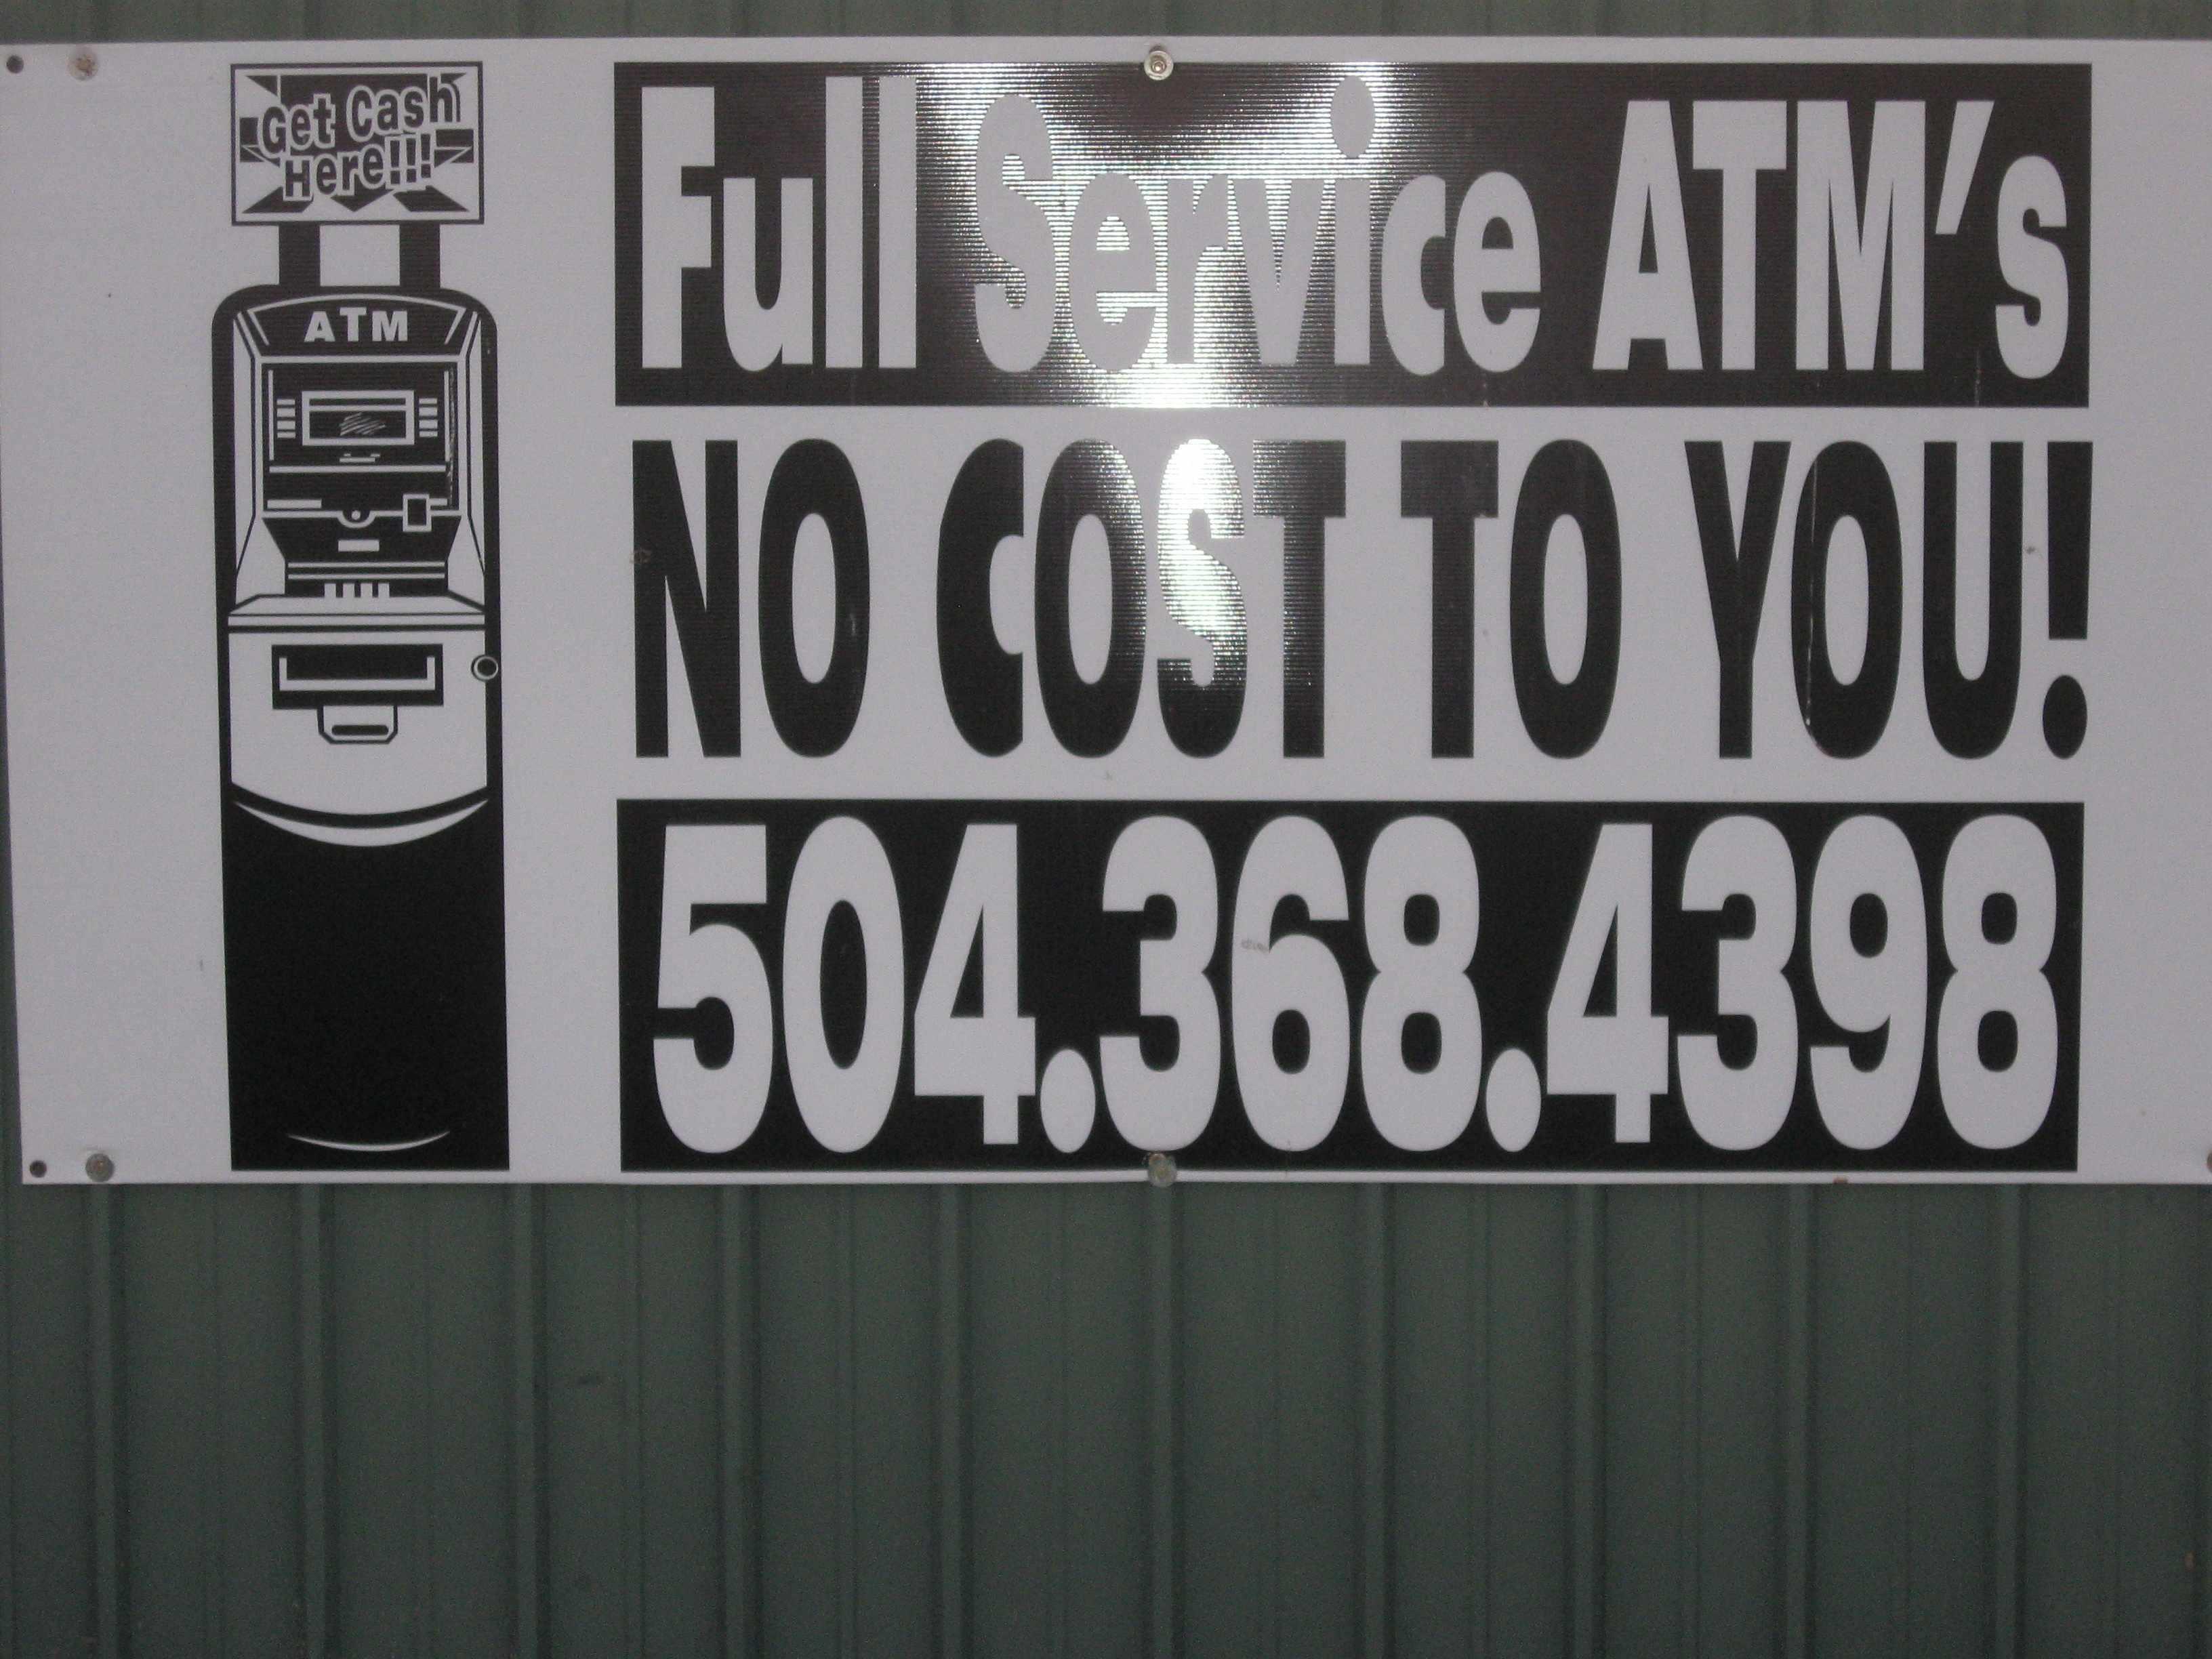 Full Service ATM